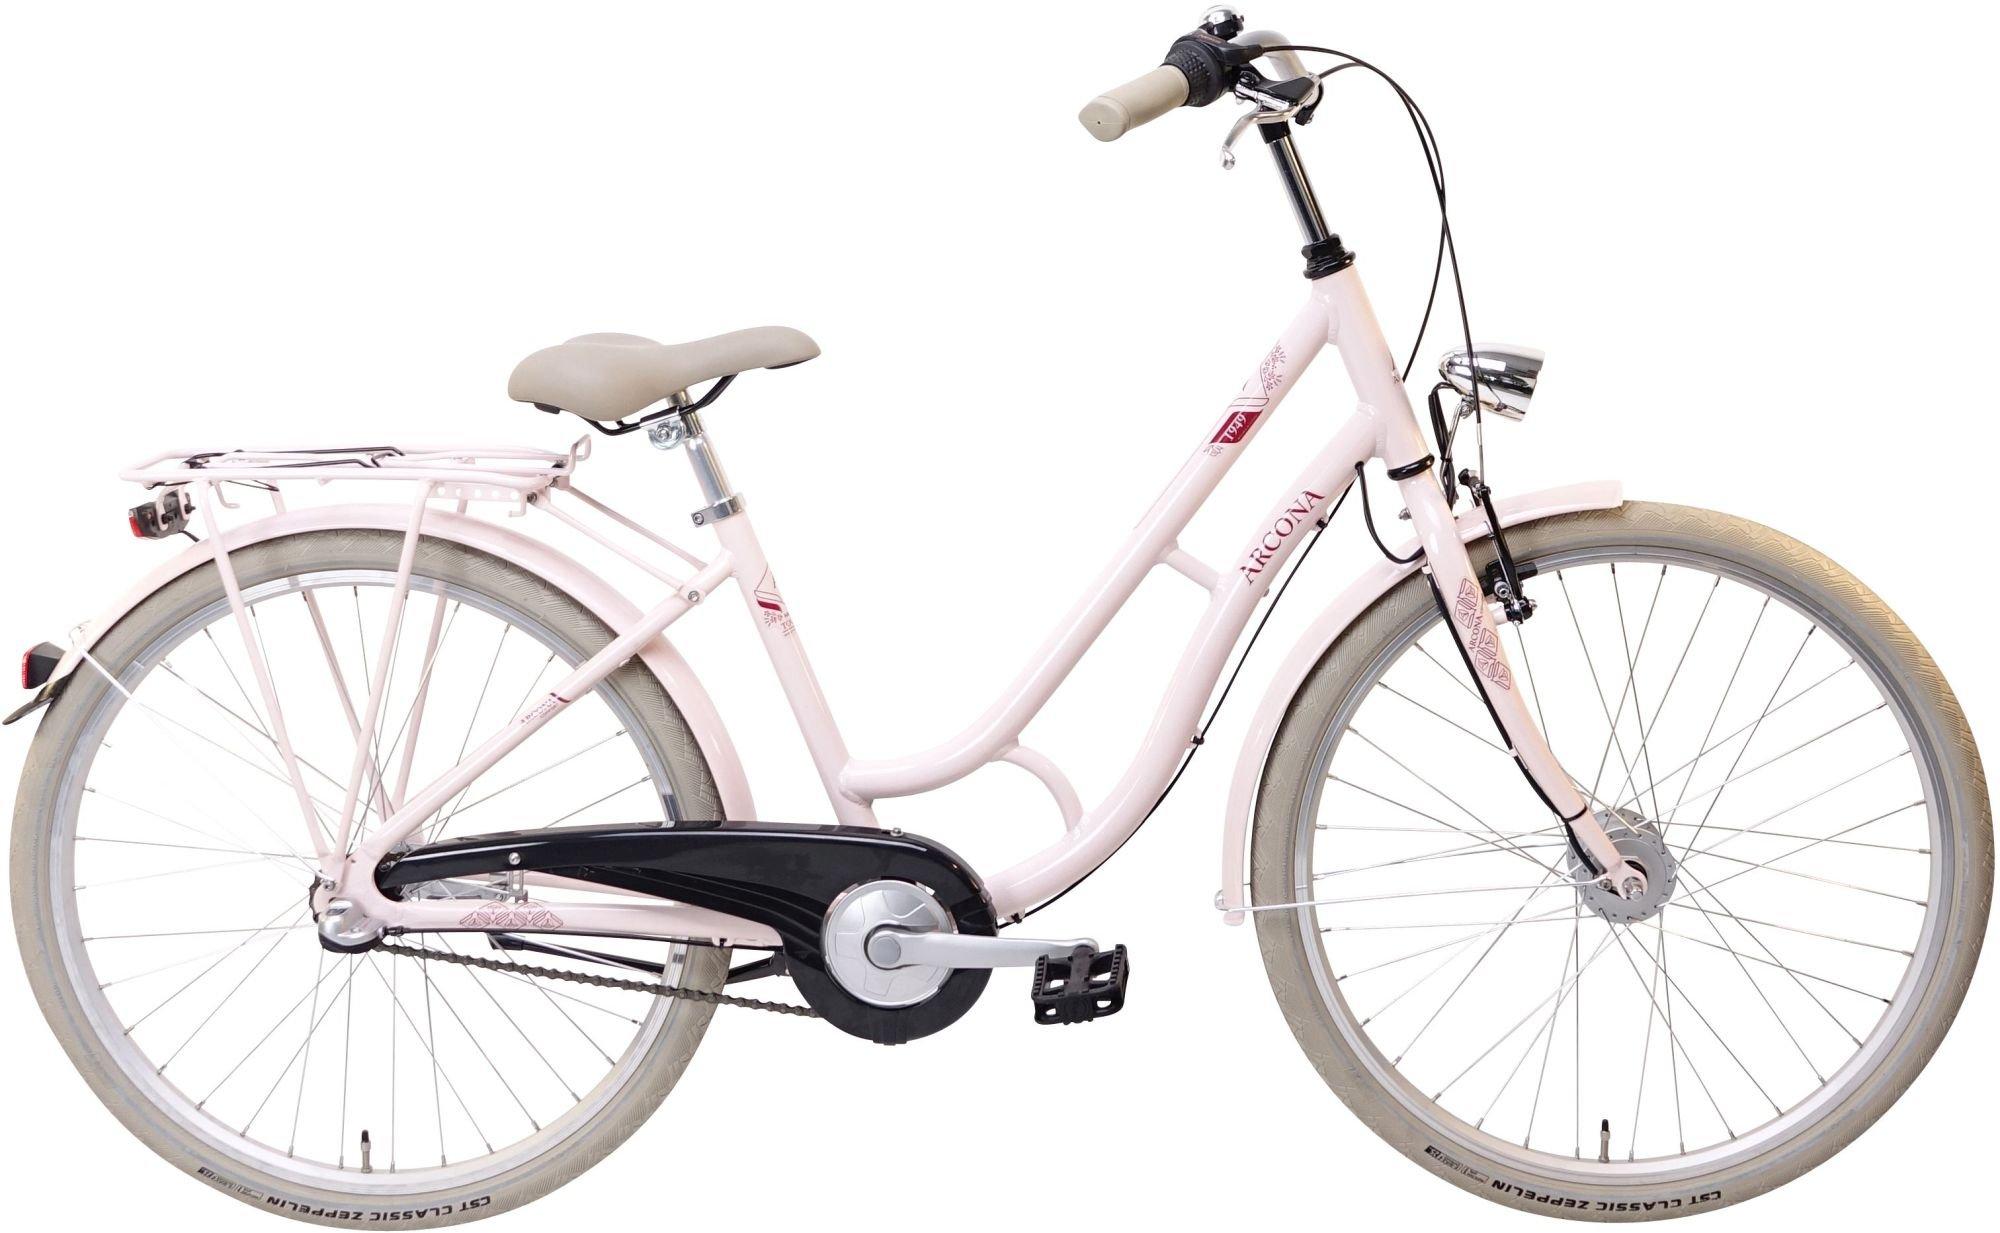 street-Fahrräder/Kinder und Jugendräder: ARCONA  1949 3 Gang Nabenschaltung Mädchenfahrrad Wave Modell 2020 26 Zoll 40 cm Sakura-